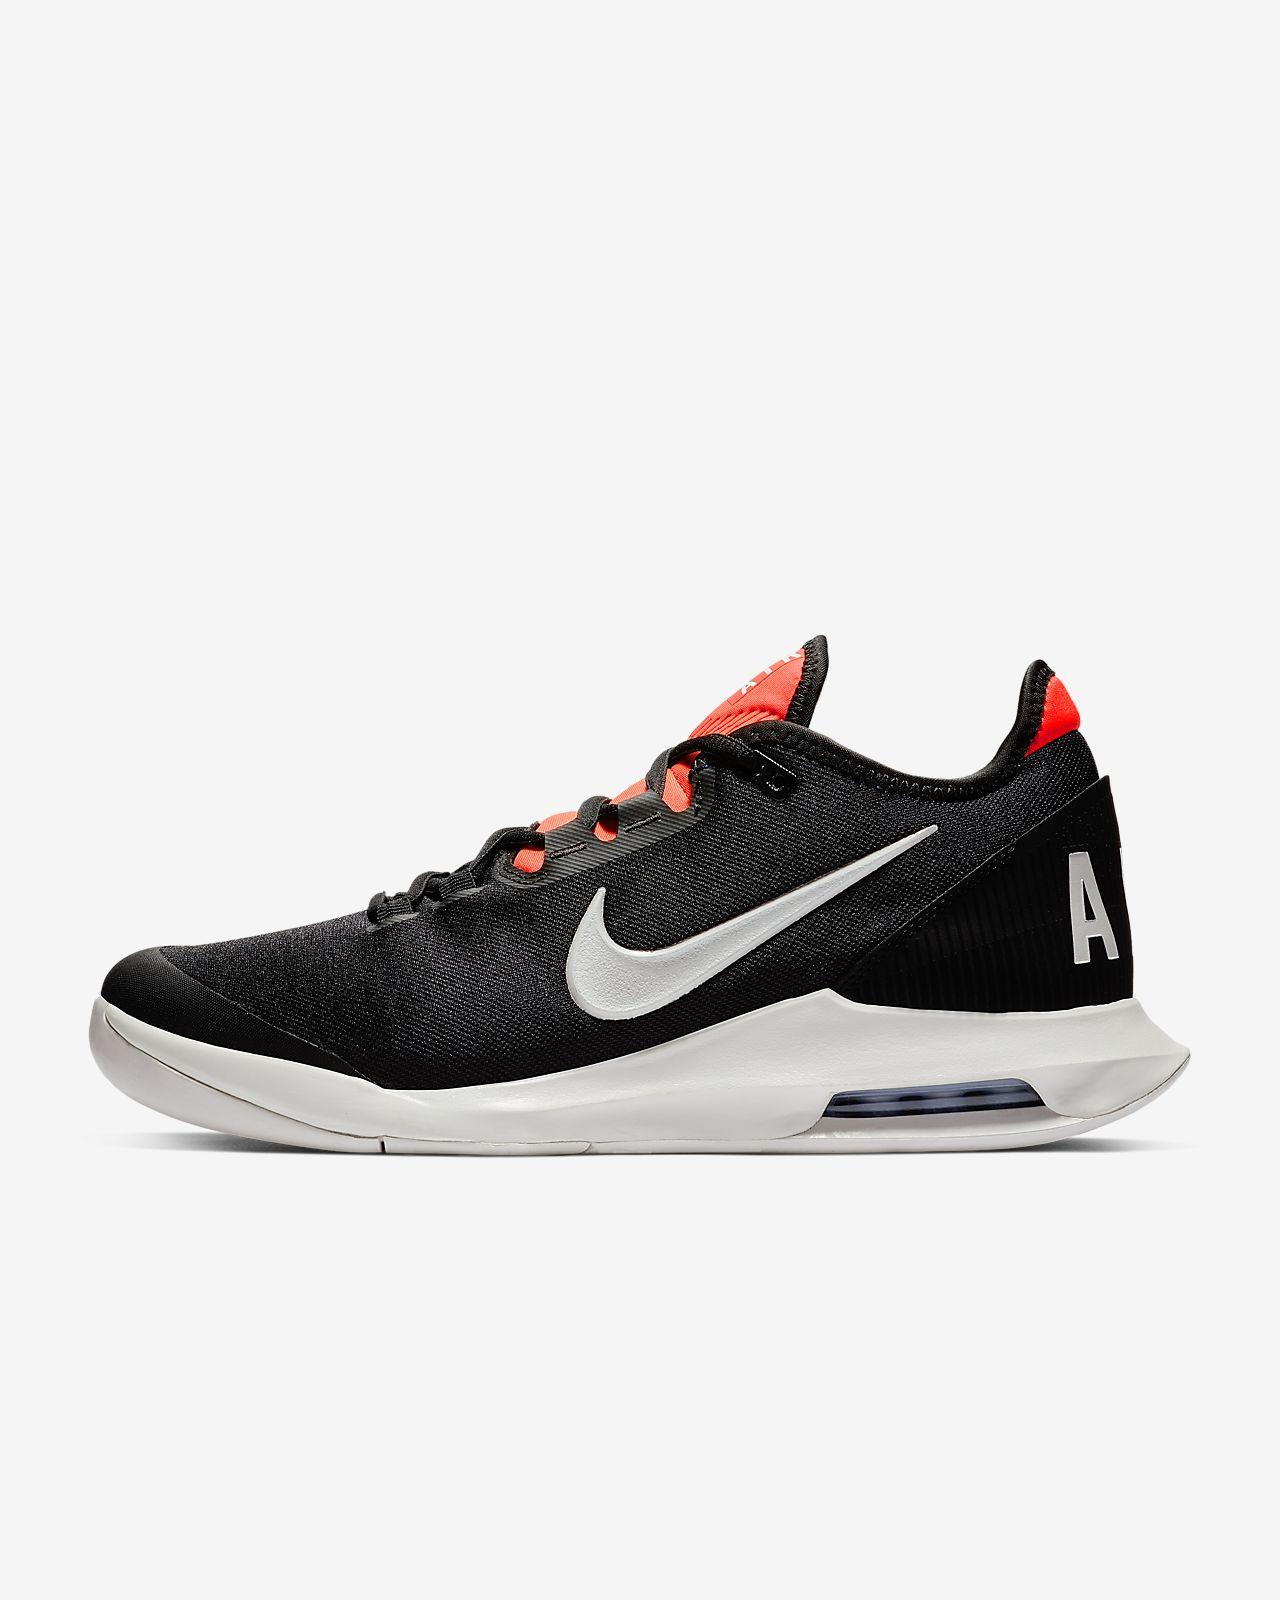 best service 9a8f4 b010a ... Tennissko NikeCourt Air Max Wildcard för män